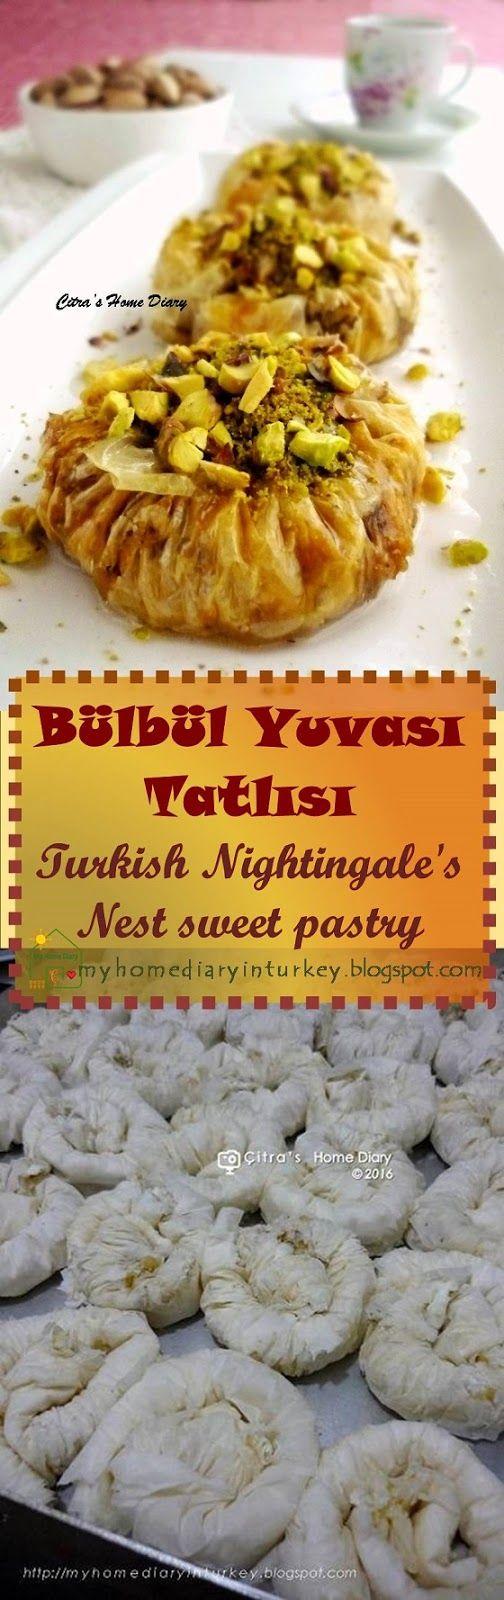 Bülbül Yuvası Tatlısı (Turkish Dessert: Nightingale's Nest sweet pastry). #baklava #turkishfood #dessert #sweets #Turkishdelight #pistachio